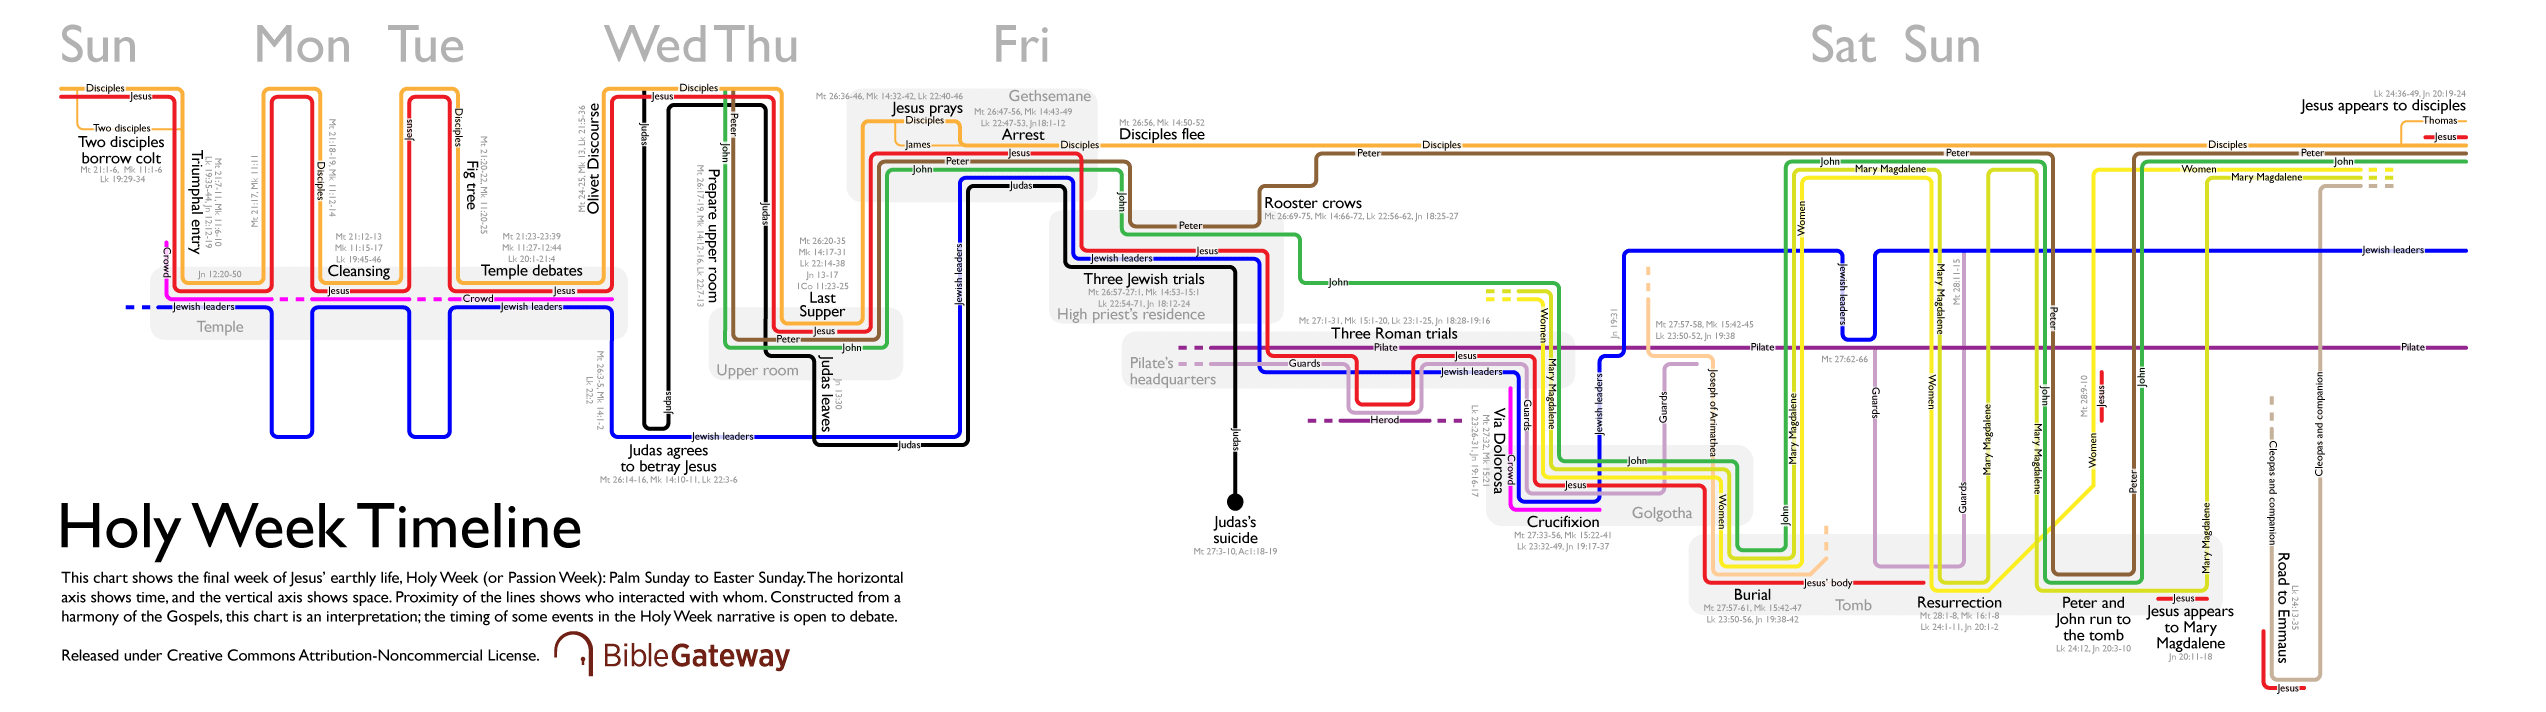 Holy Week timeline visualization